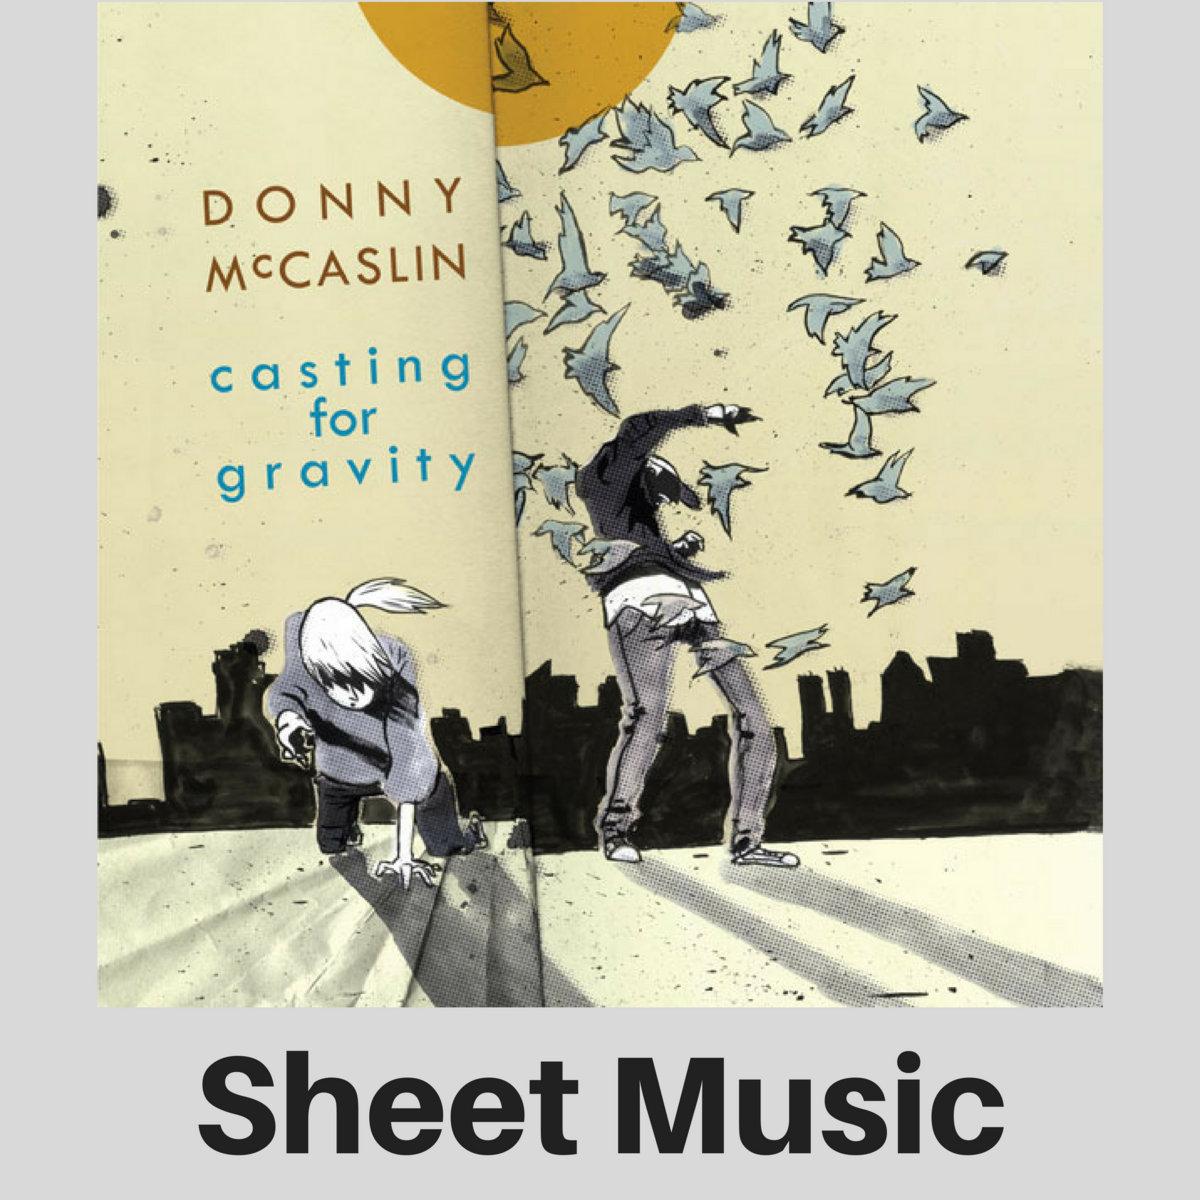 Donny McCaslin | Casting for Gravity | Sheet Music (PDF